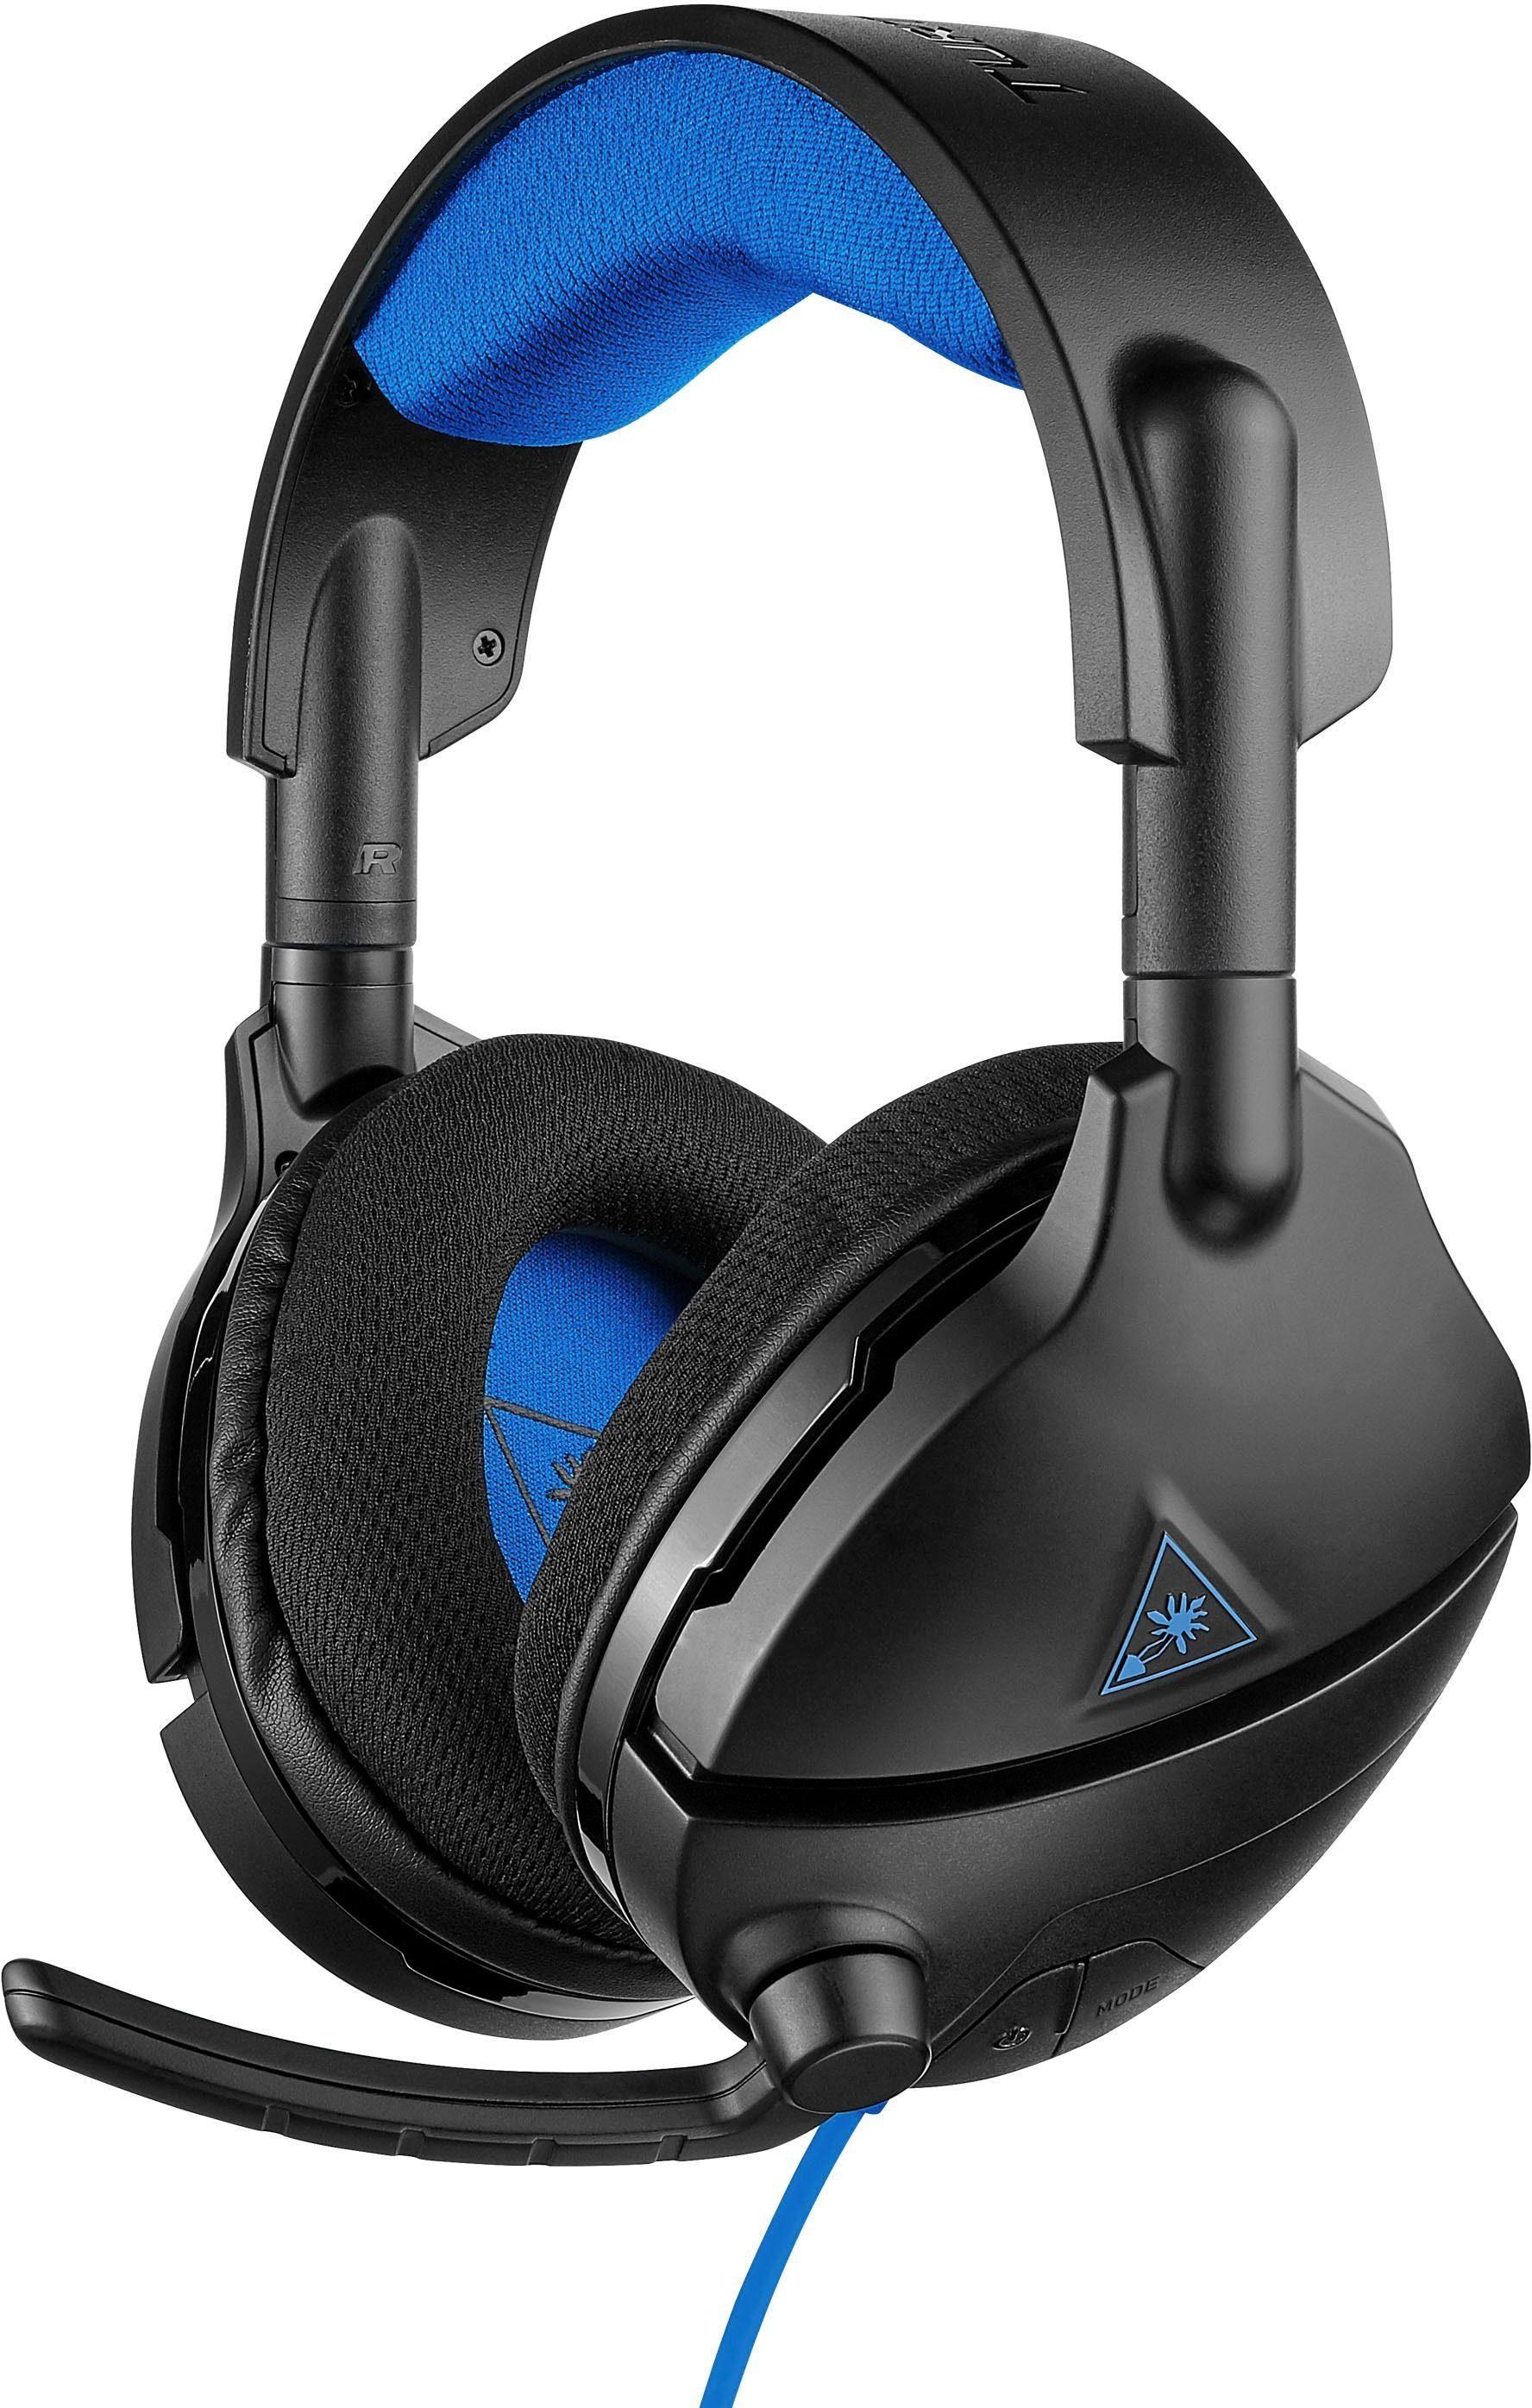 Turtle Beach »Stealth 300« Gaming-Headset (Mikrofondesign: Hochklappbares Kugelmikrofon)